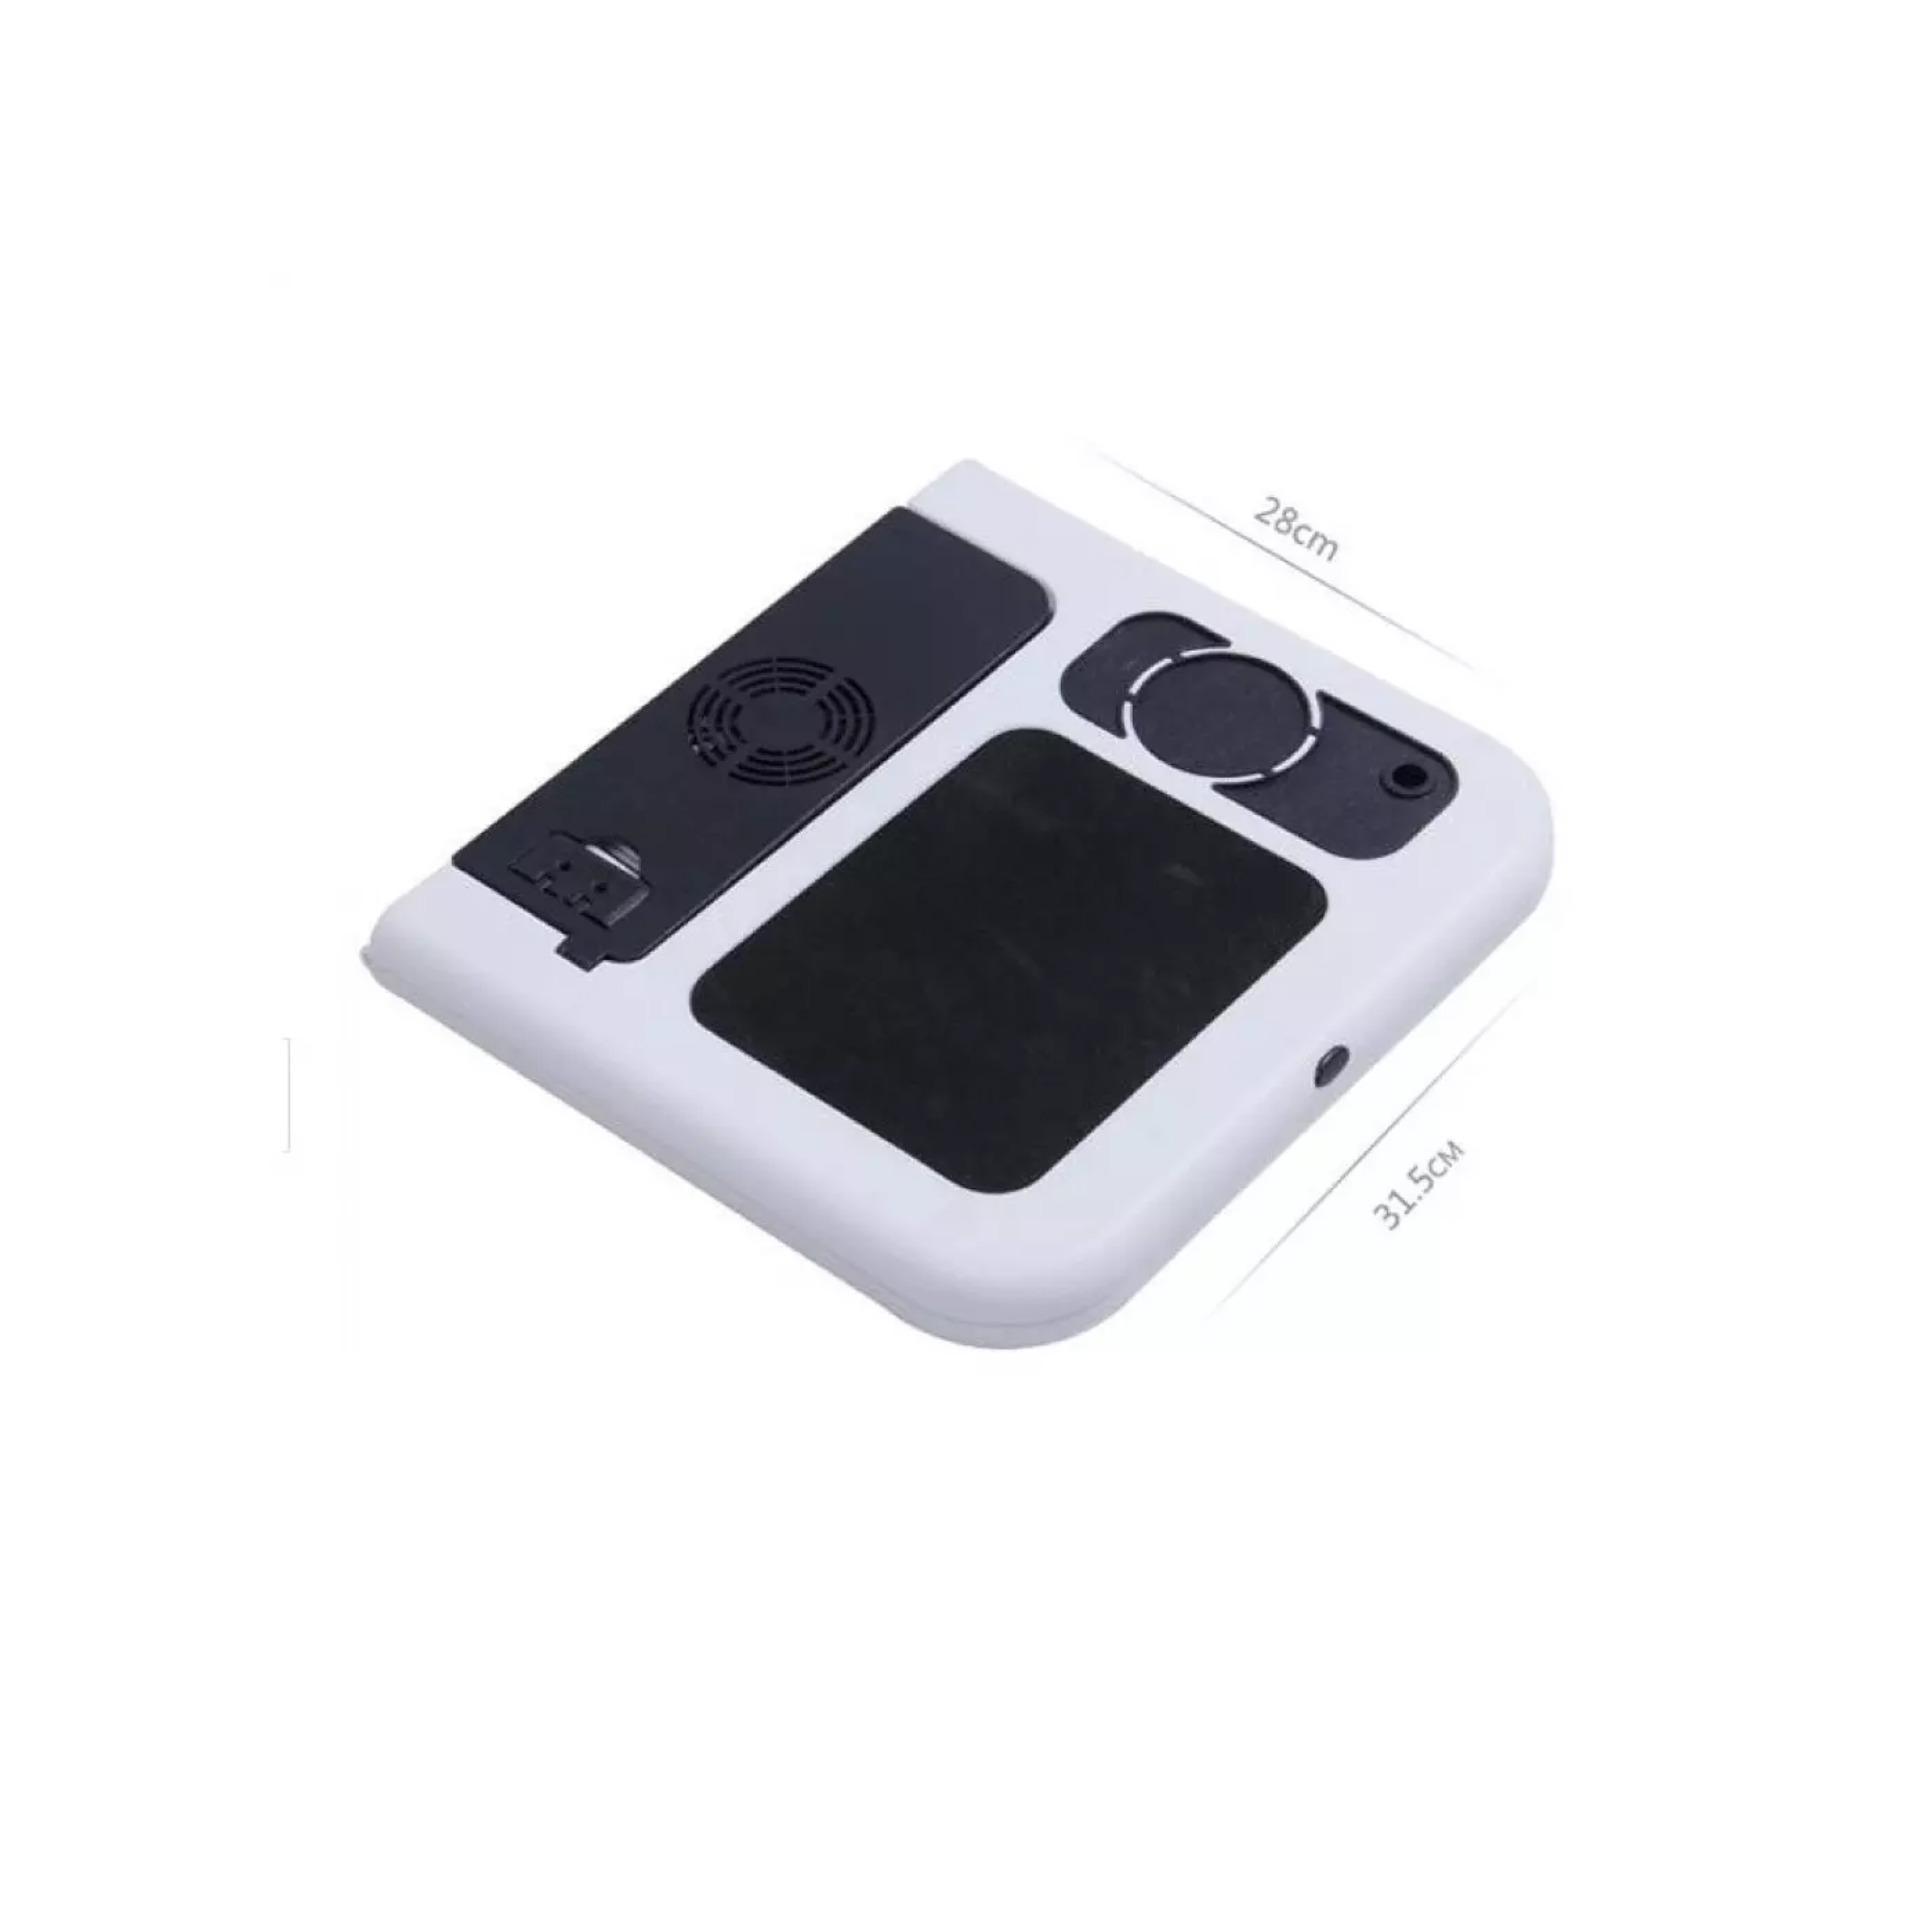 Niceeshop Laptop Pendingin Dengan Kipas Penyedot Debu Cooling Pad Bigfan Coolerpad Nc33 Meja Lipat Portable Best Seller